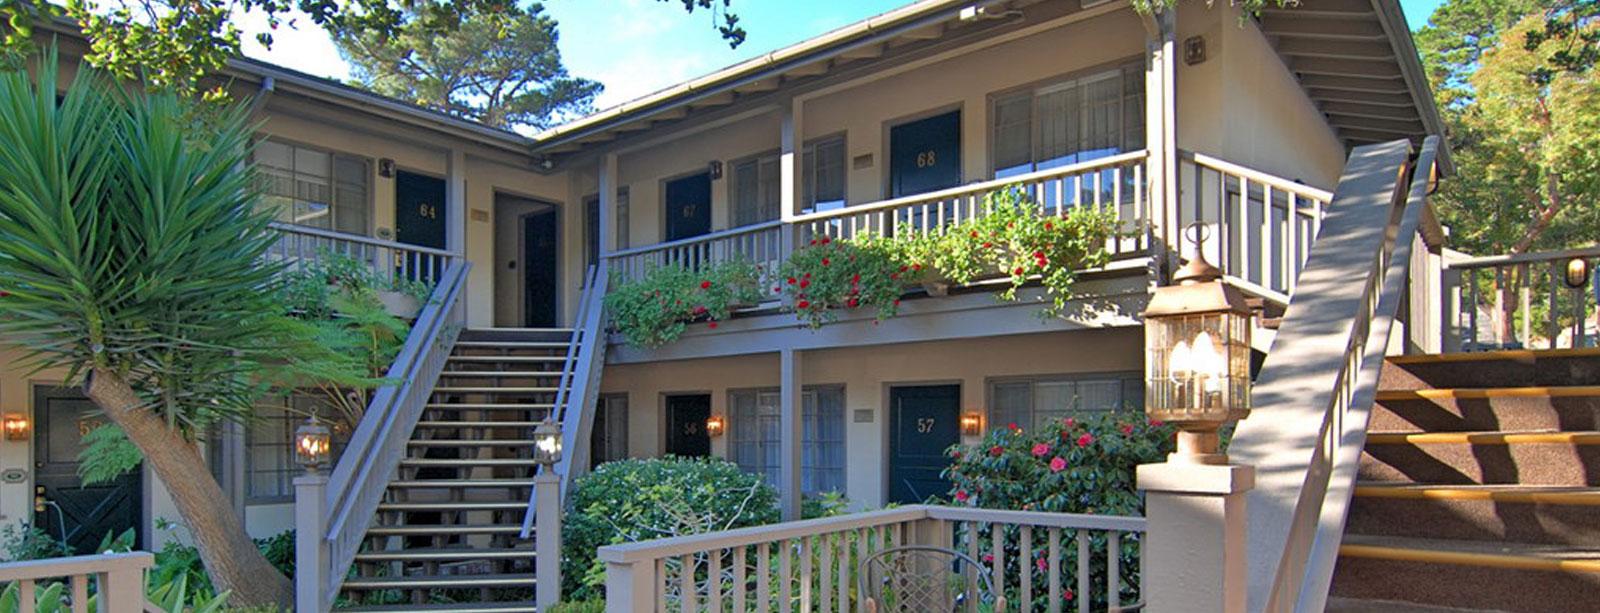 Comfort Inn Carmel by the Sea, California